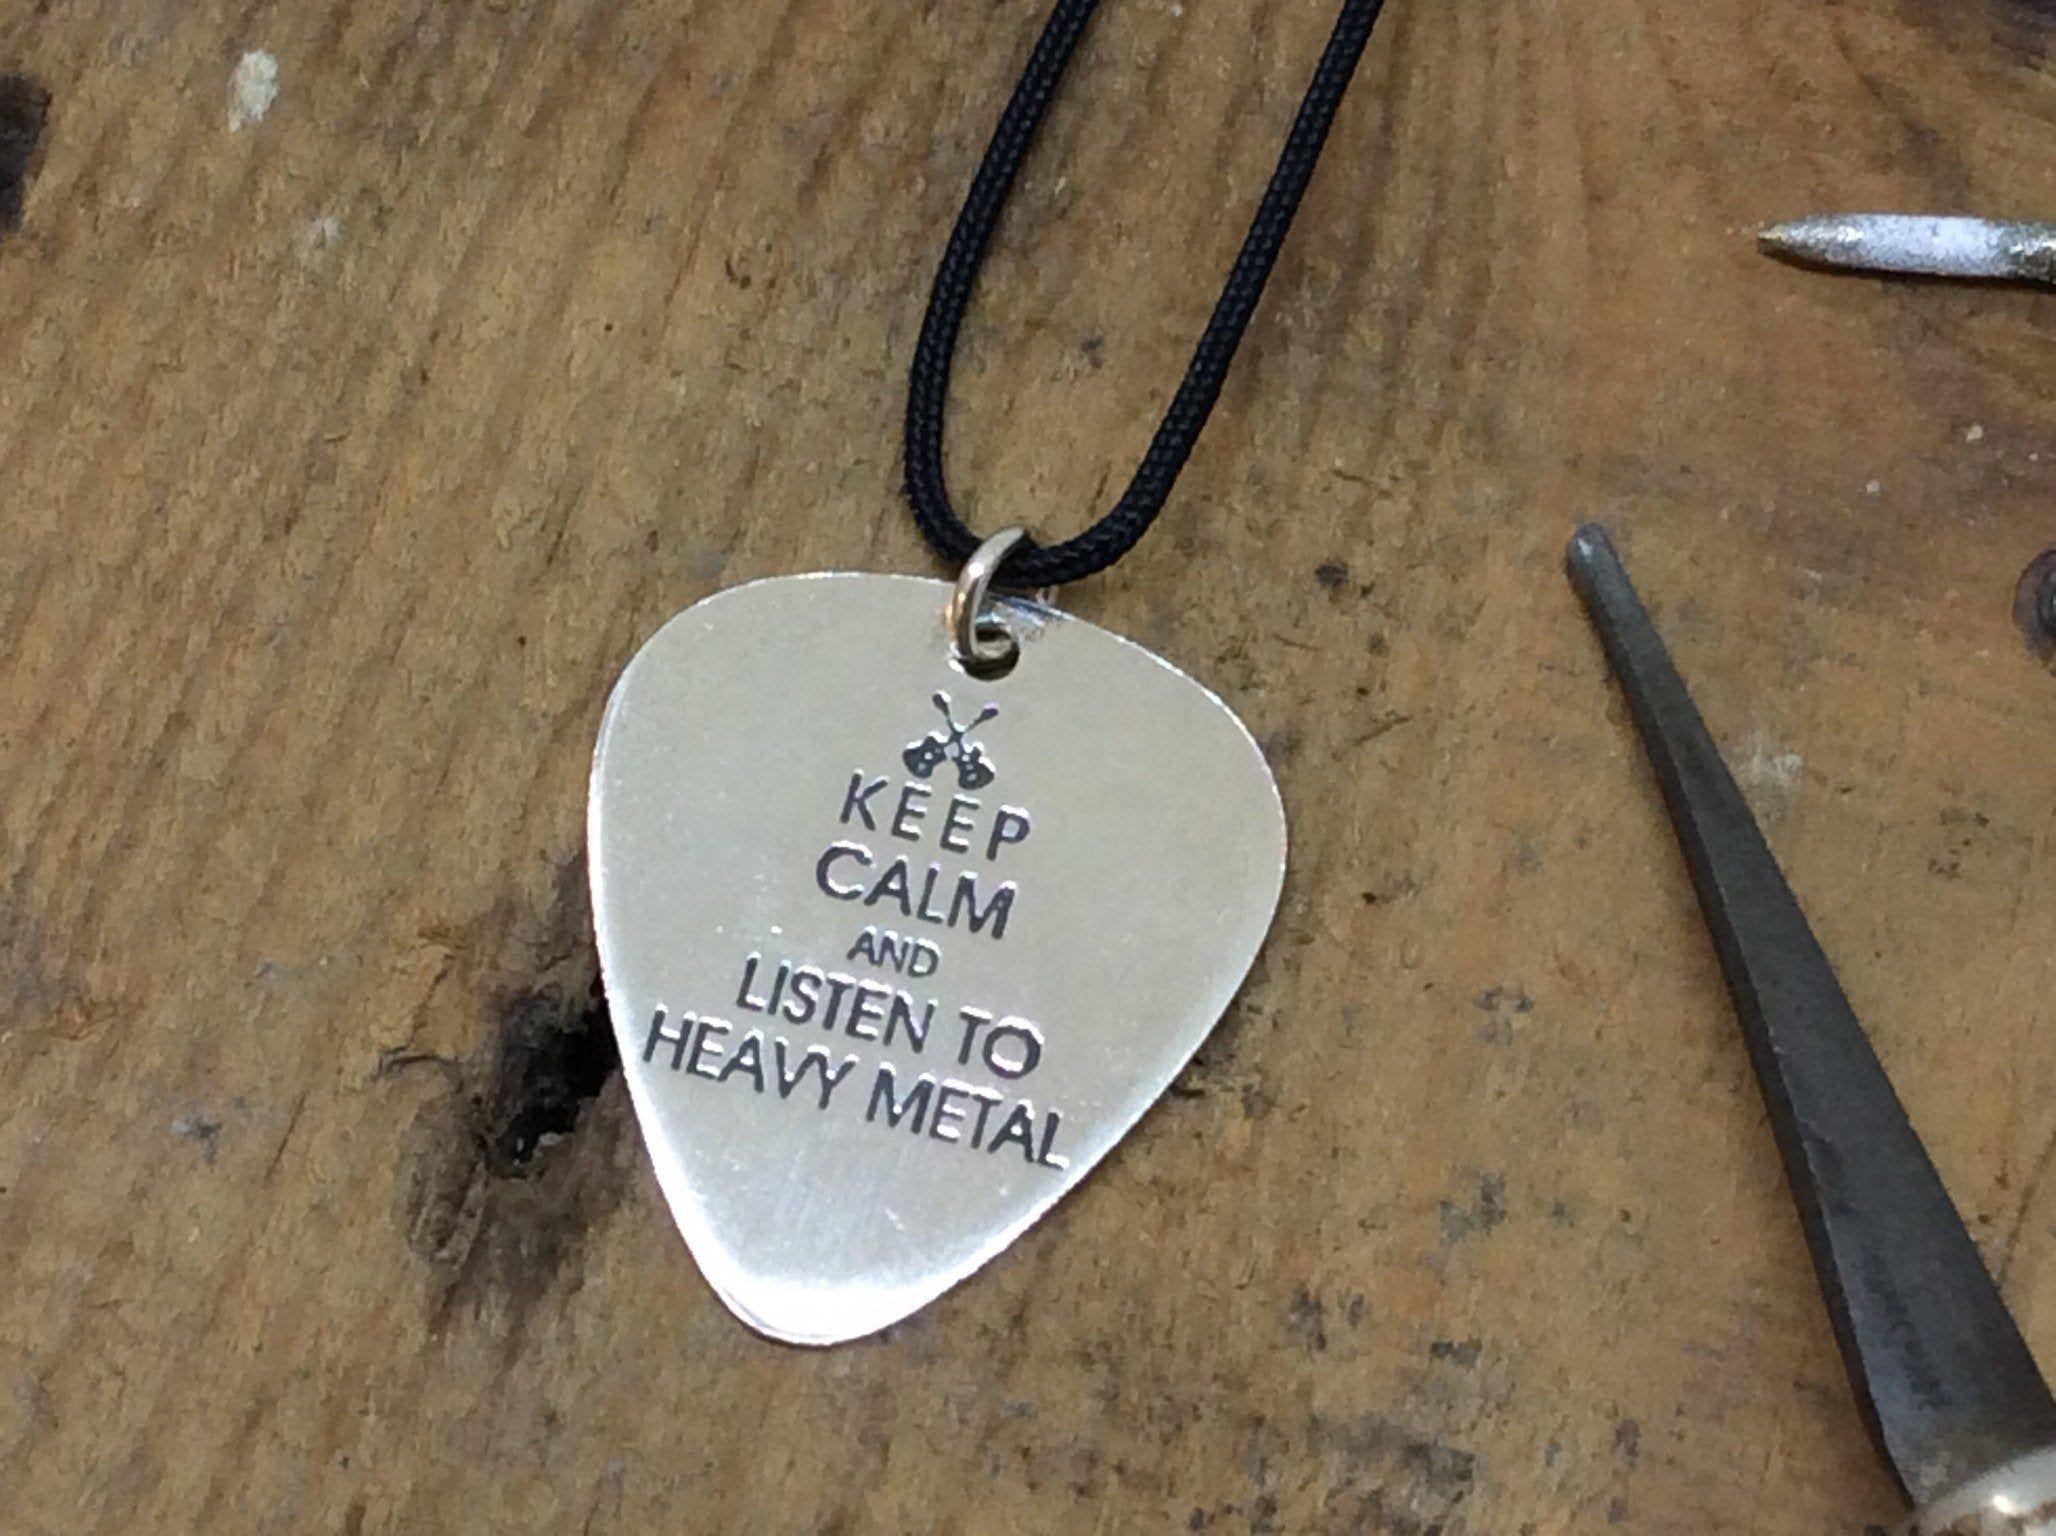 Custom guitar pick,Keep calm guitar pick necklace for men,Music teacher gift,Long distance boyfriend gift,Unique handmade jewelry gift #customguitars